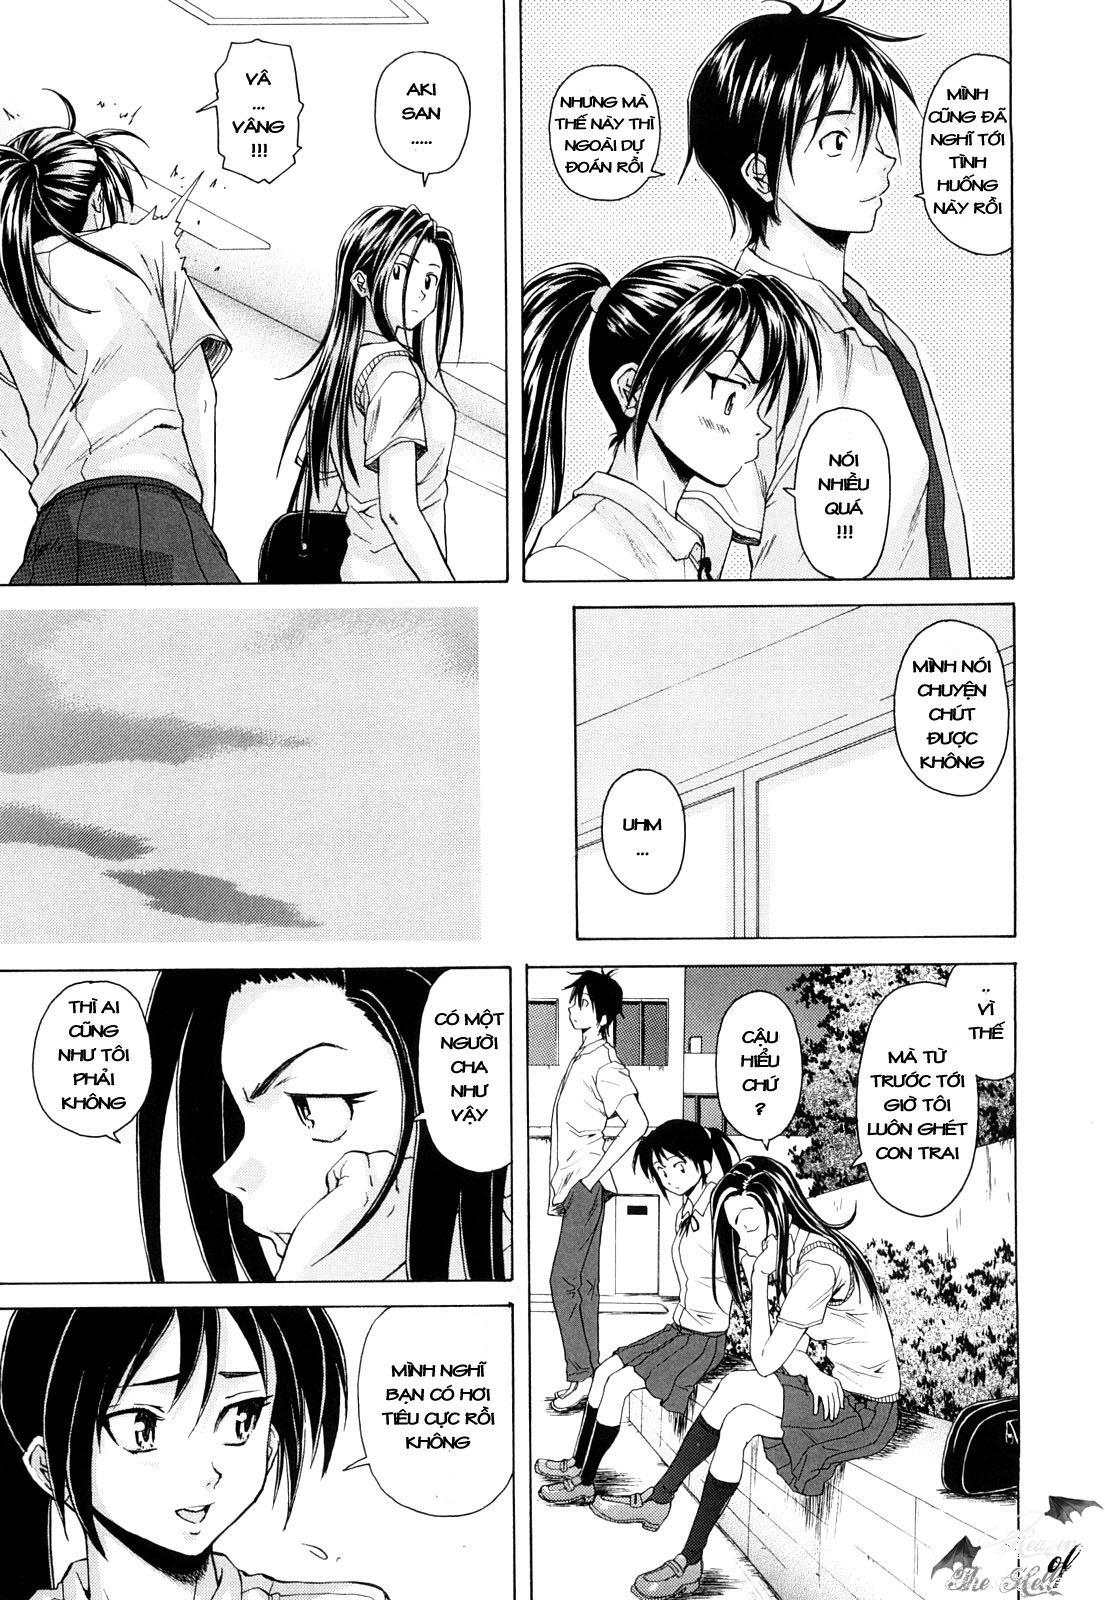 TruyenHay.Com - Ảnh 8 - Setsunai Omoi Chapter 3